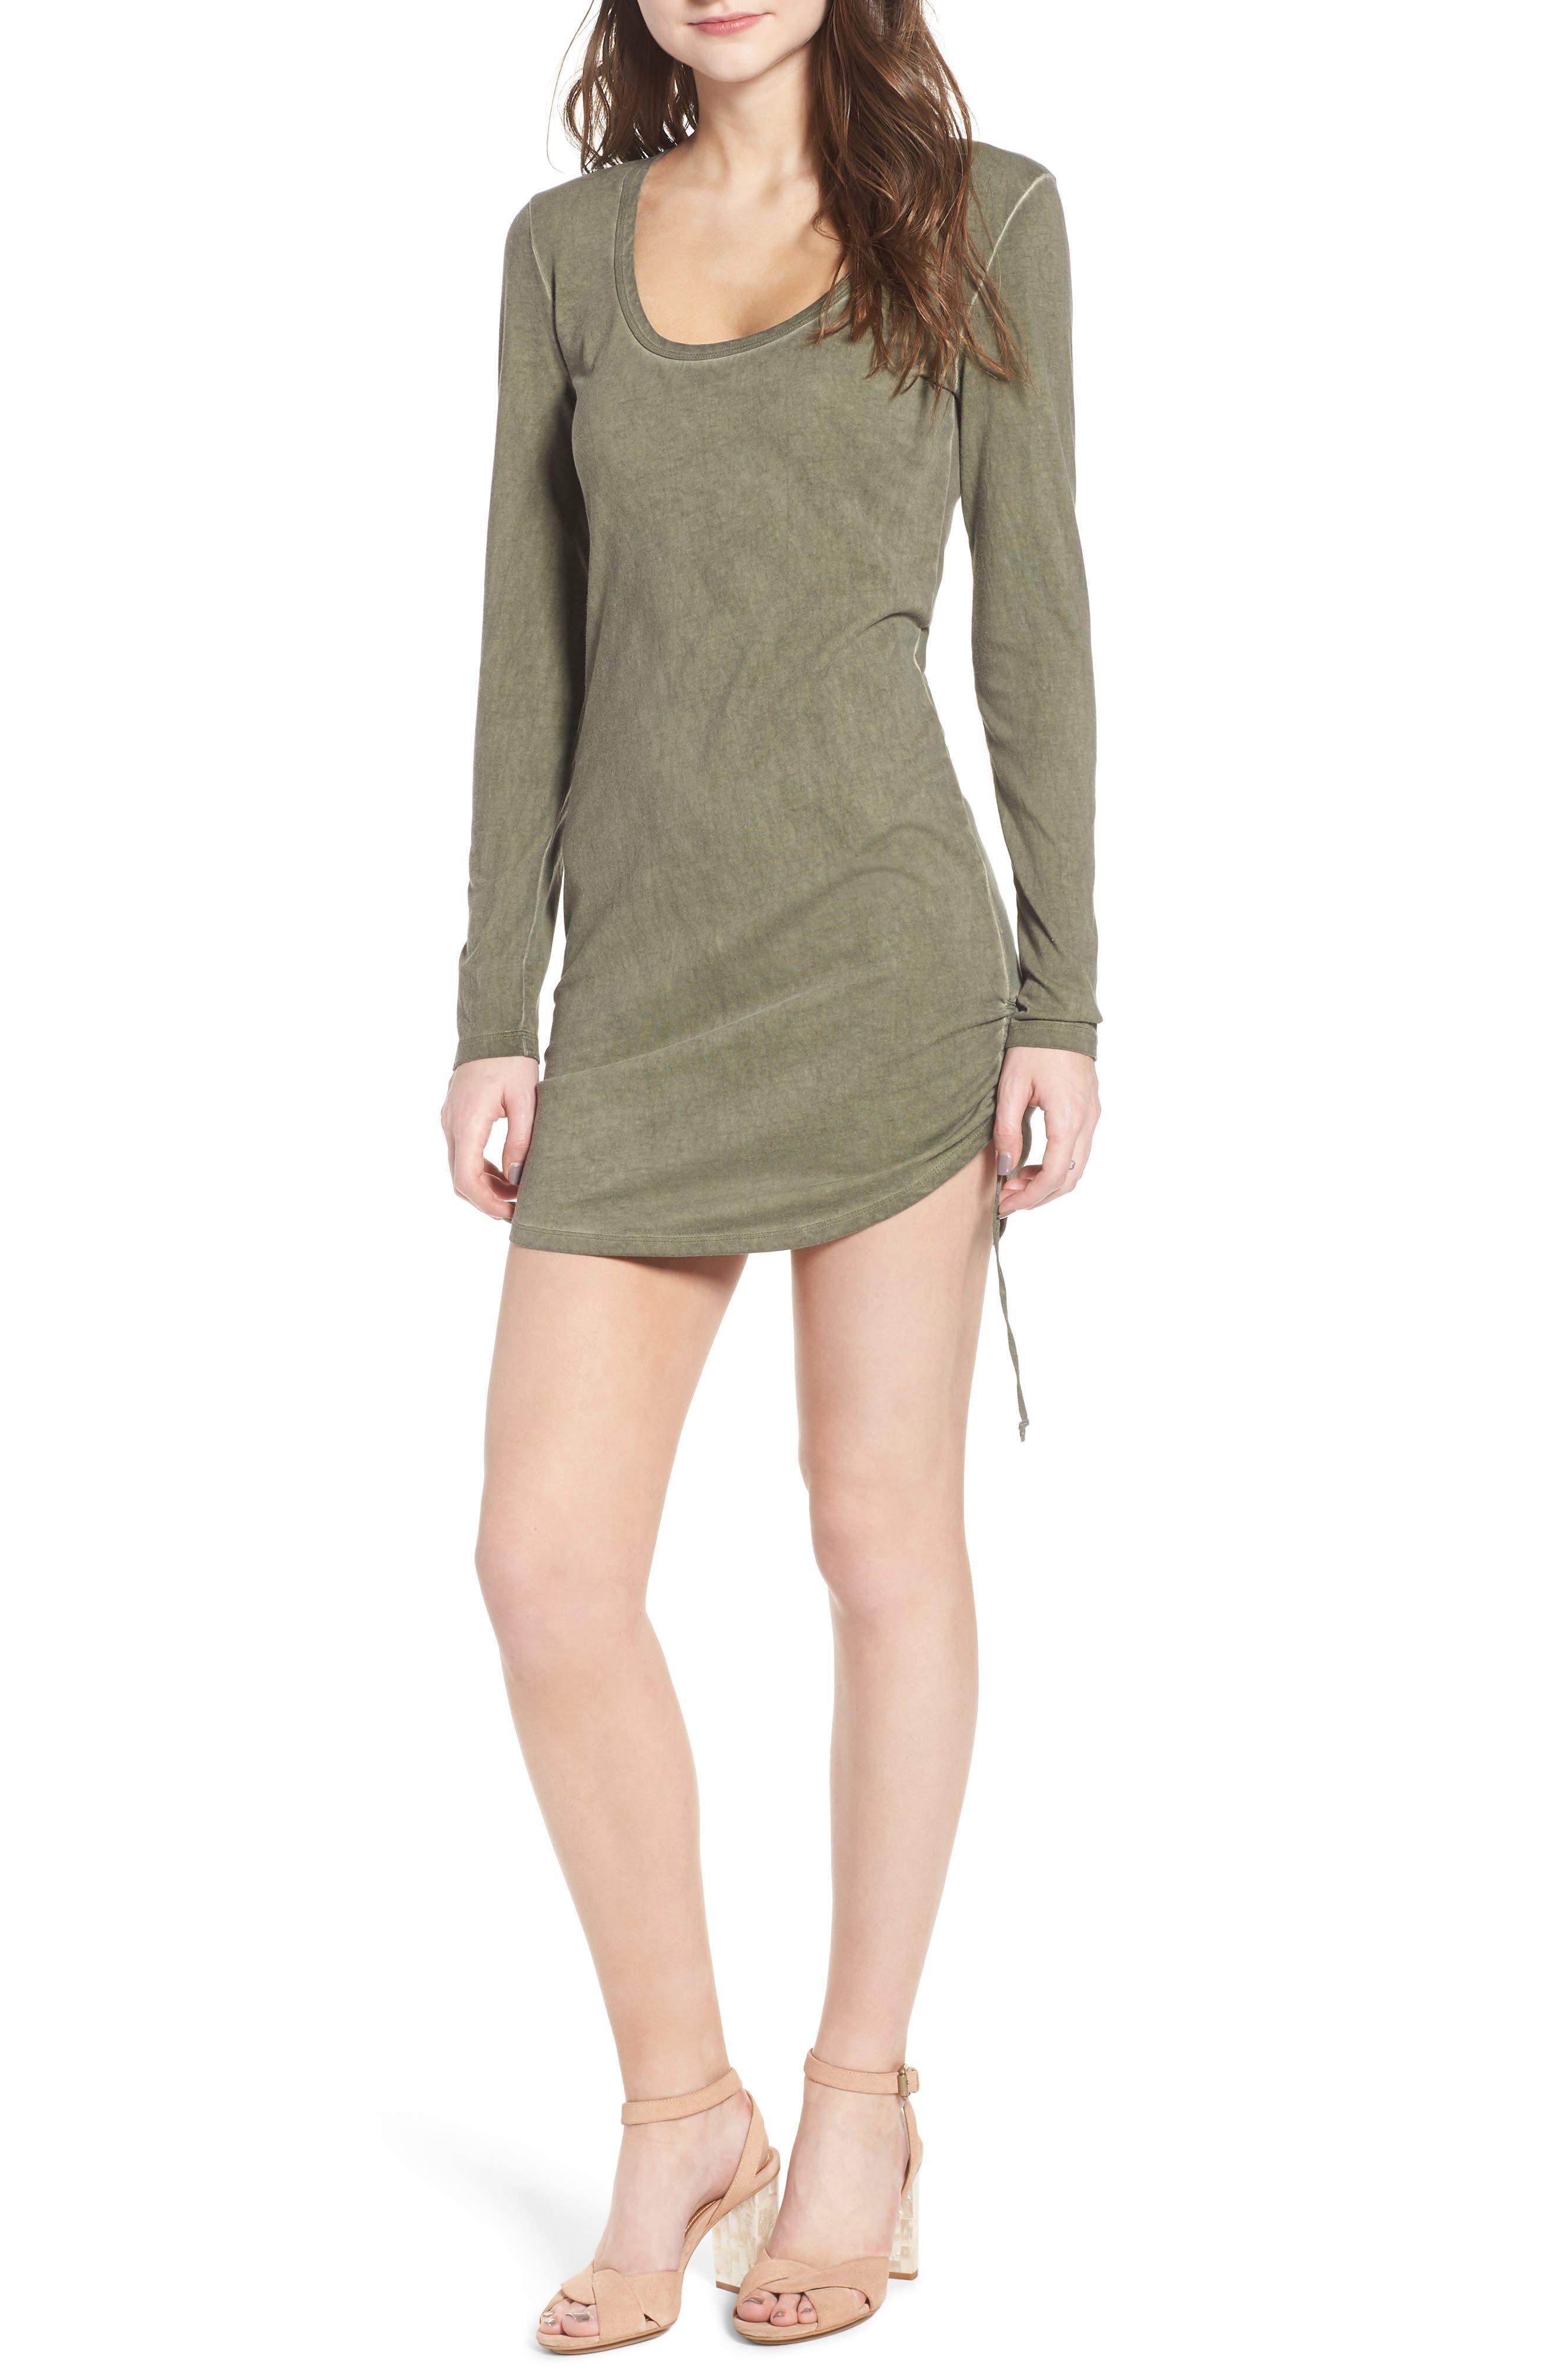 Scoop Neck Body-Con Dress,                             Main thumbnail 1, color,                             304